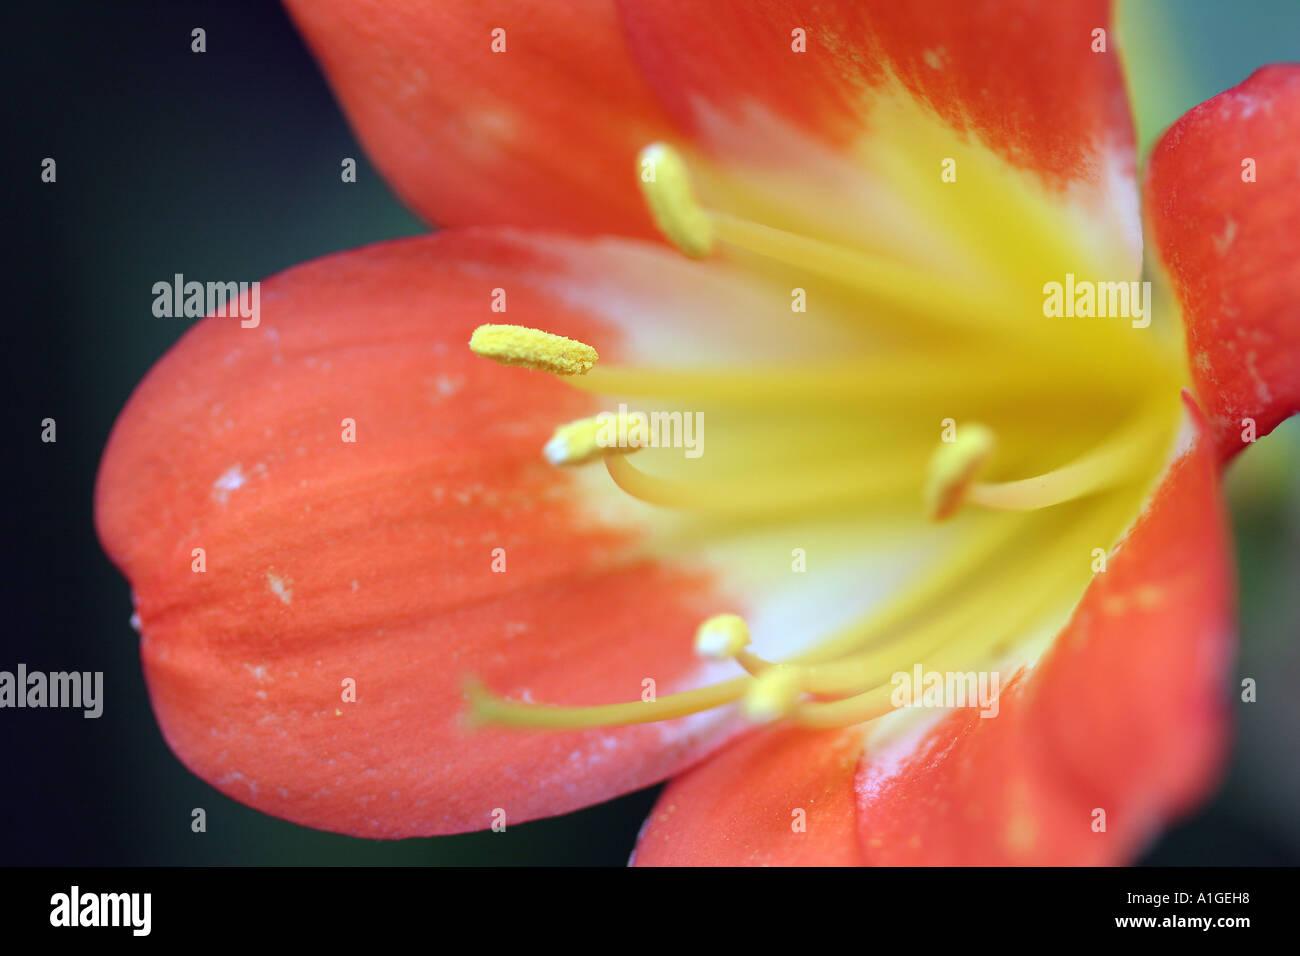 Bush lily Clivia miniata Regel Amaryllidaceae - Stock Image